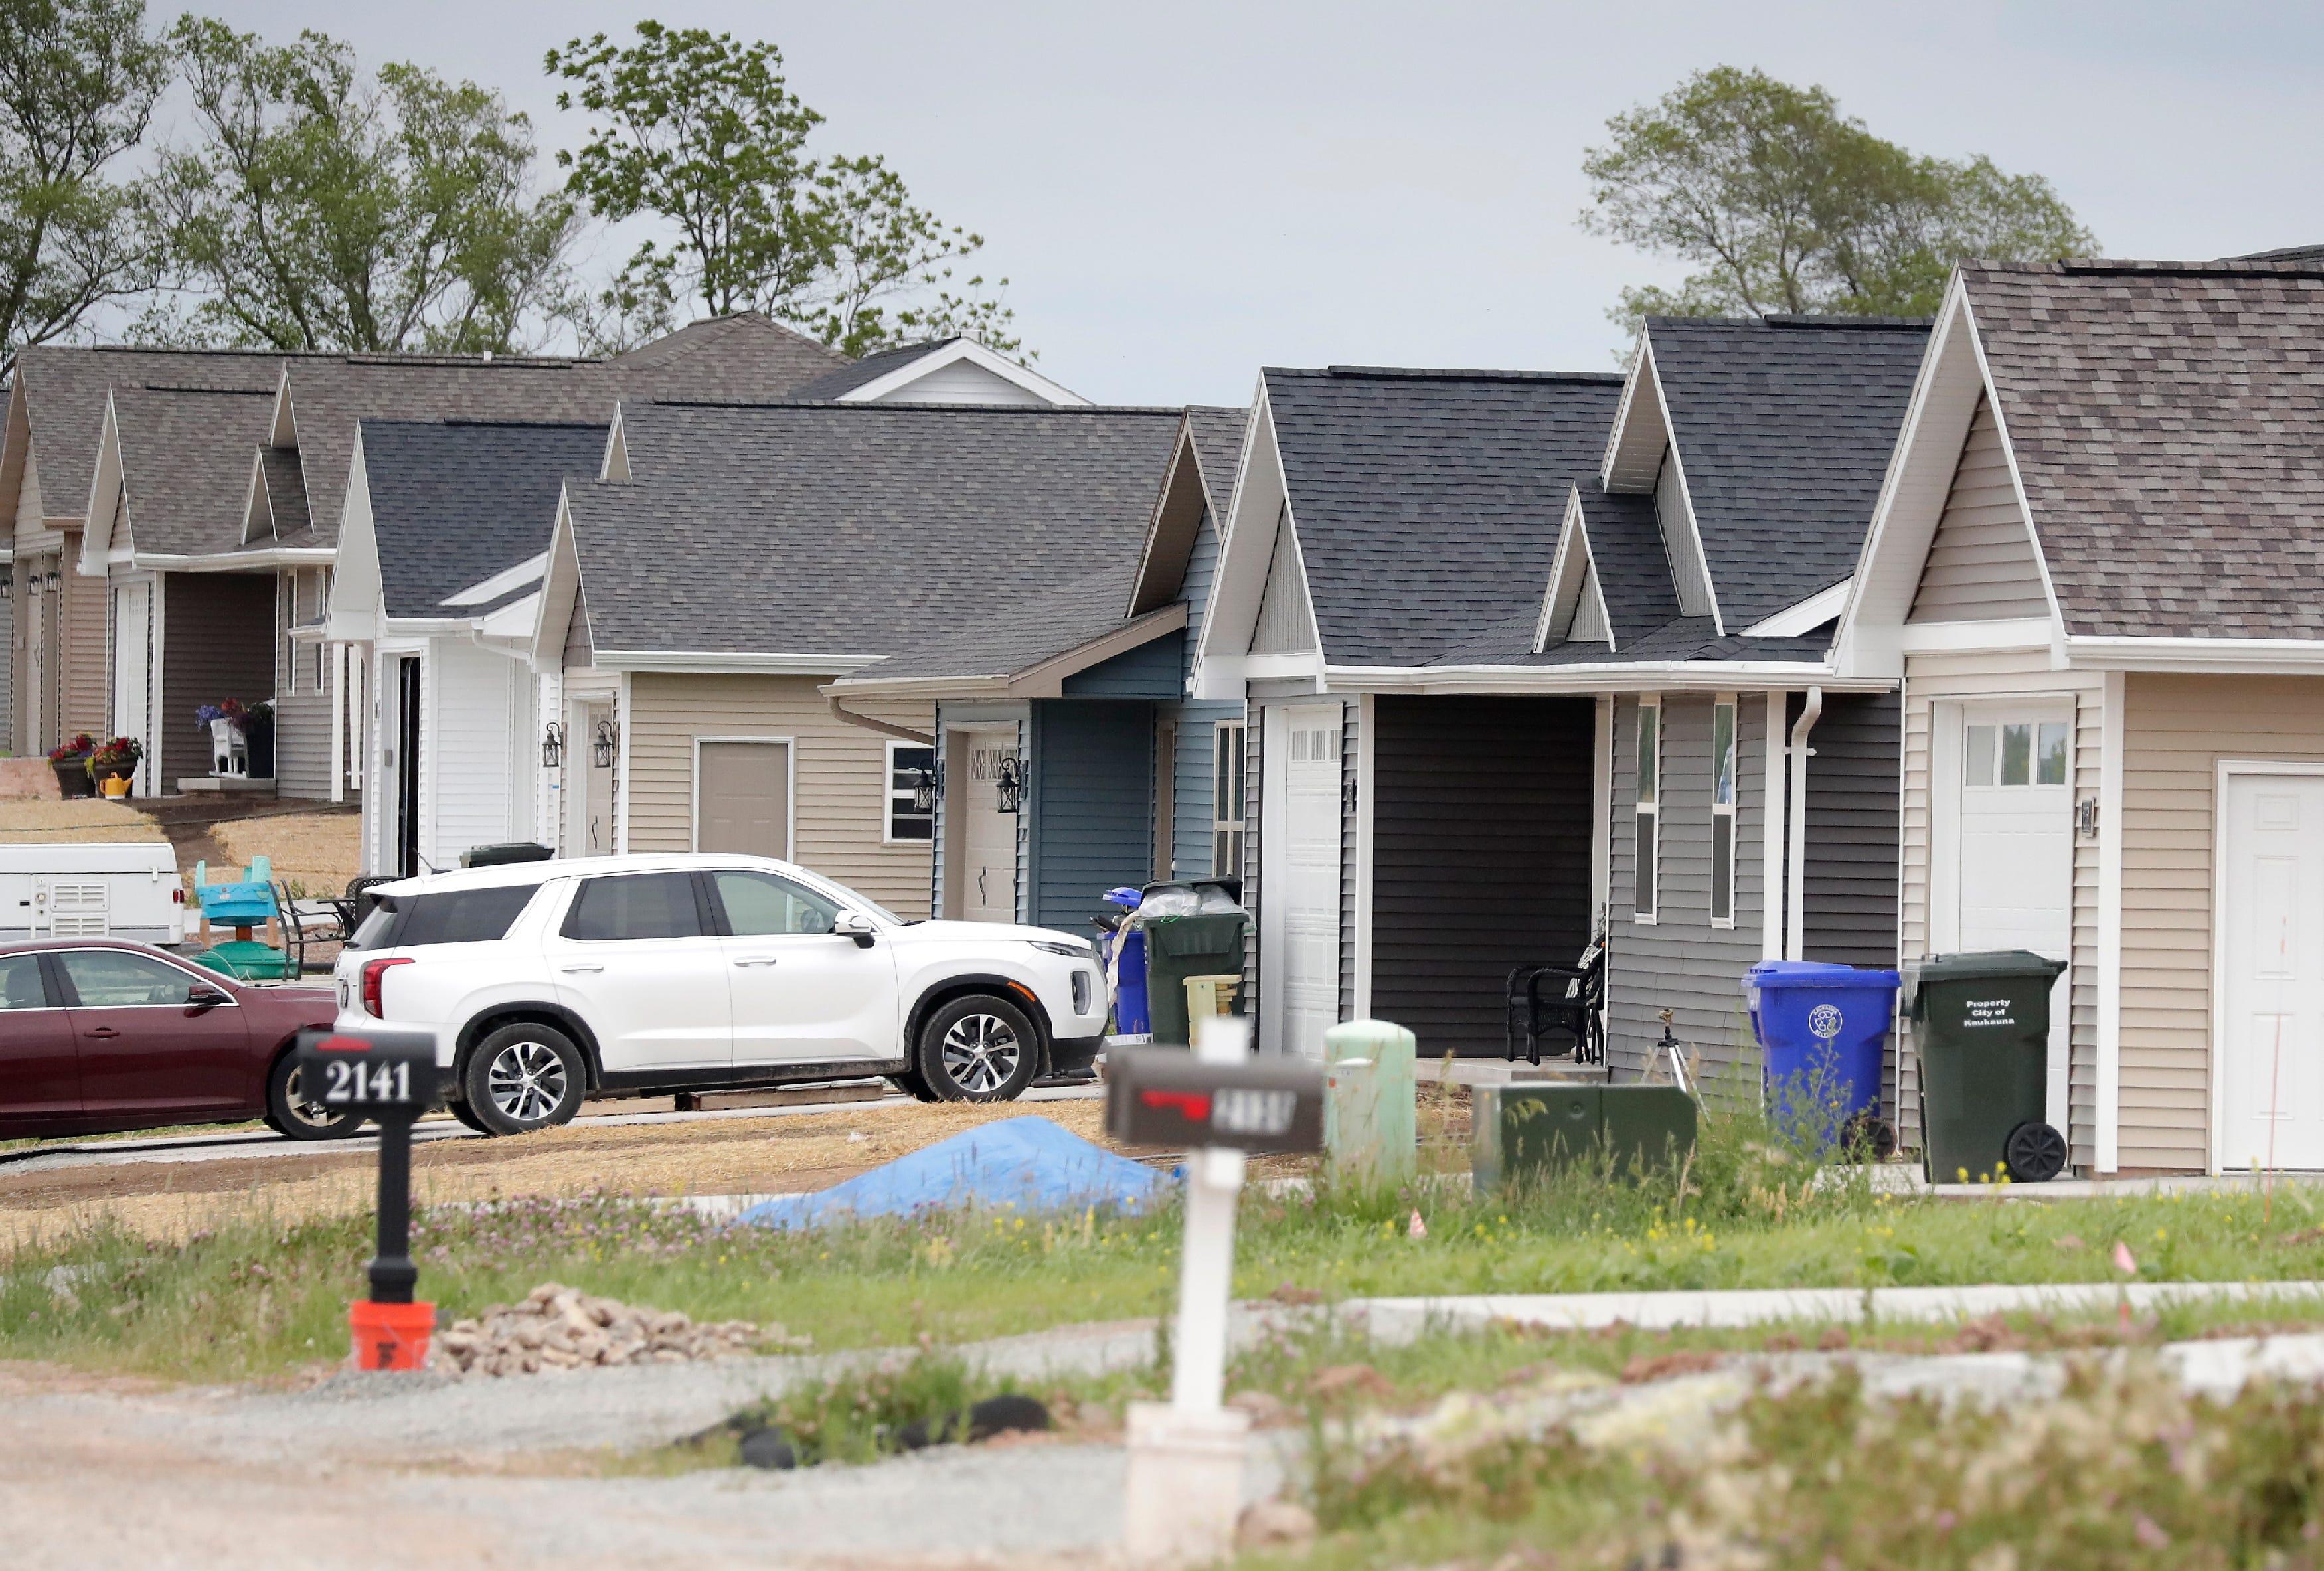 Homes built by Tom McHugh Construction near Haas Road in Kaukauna.